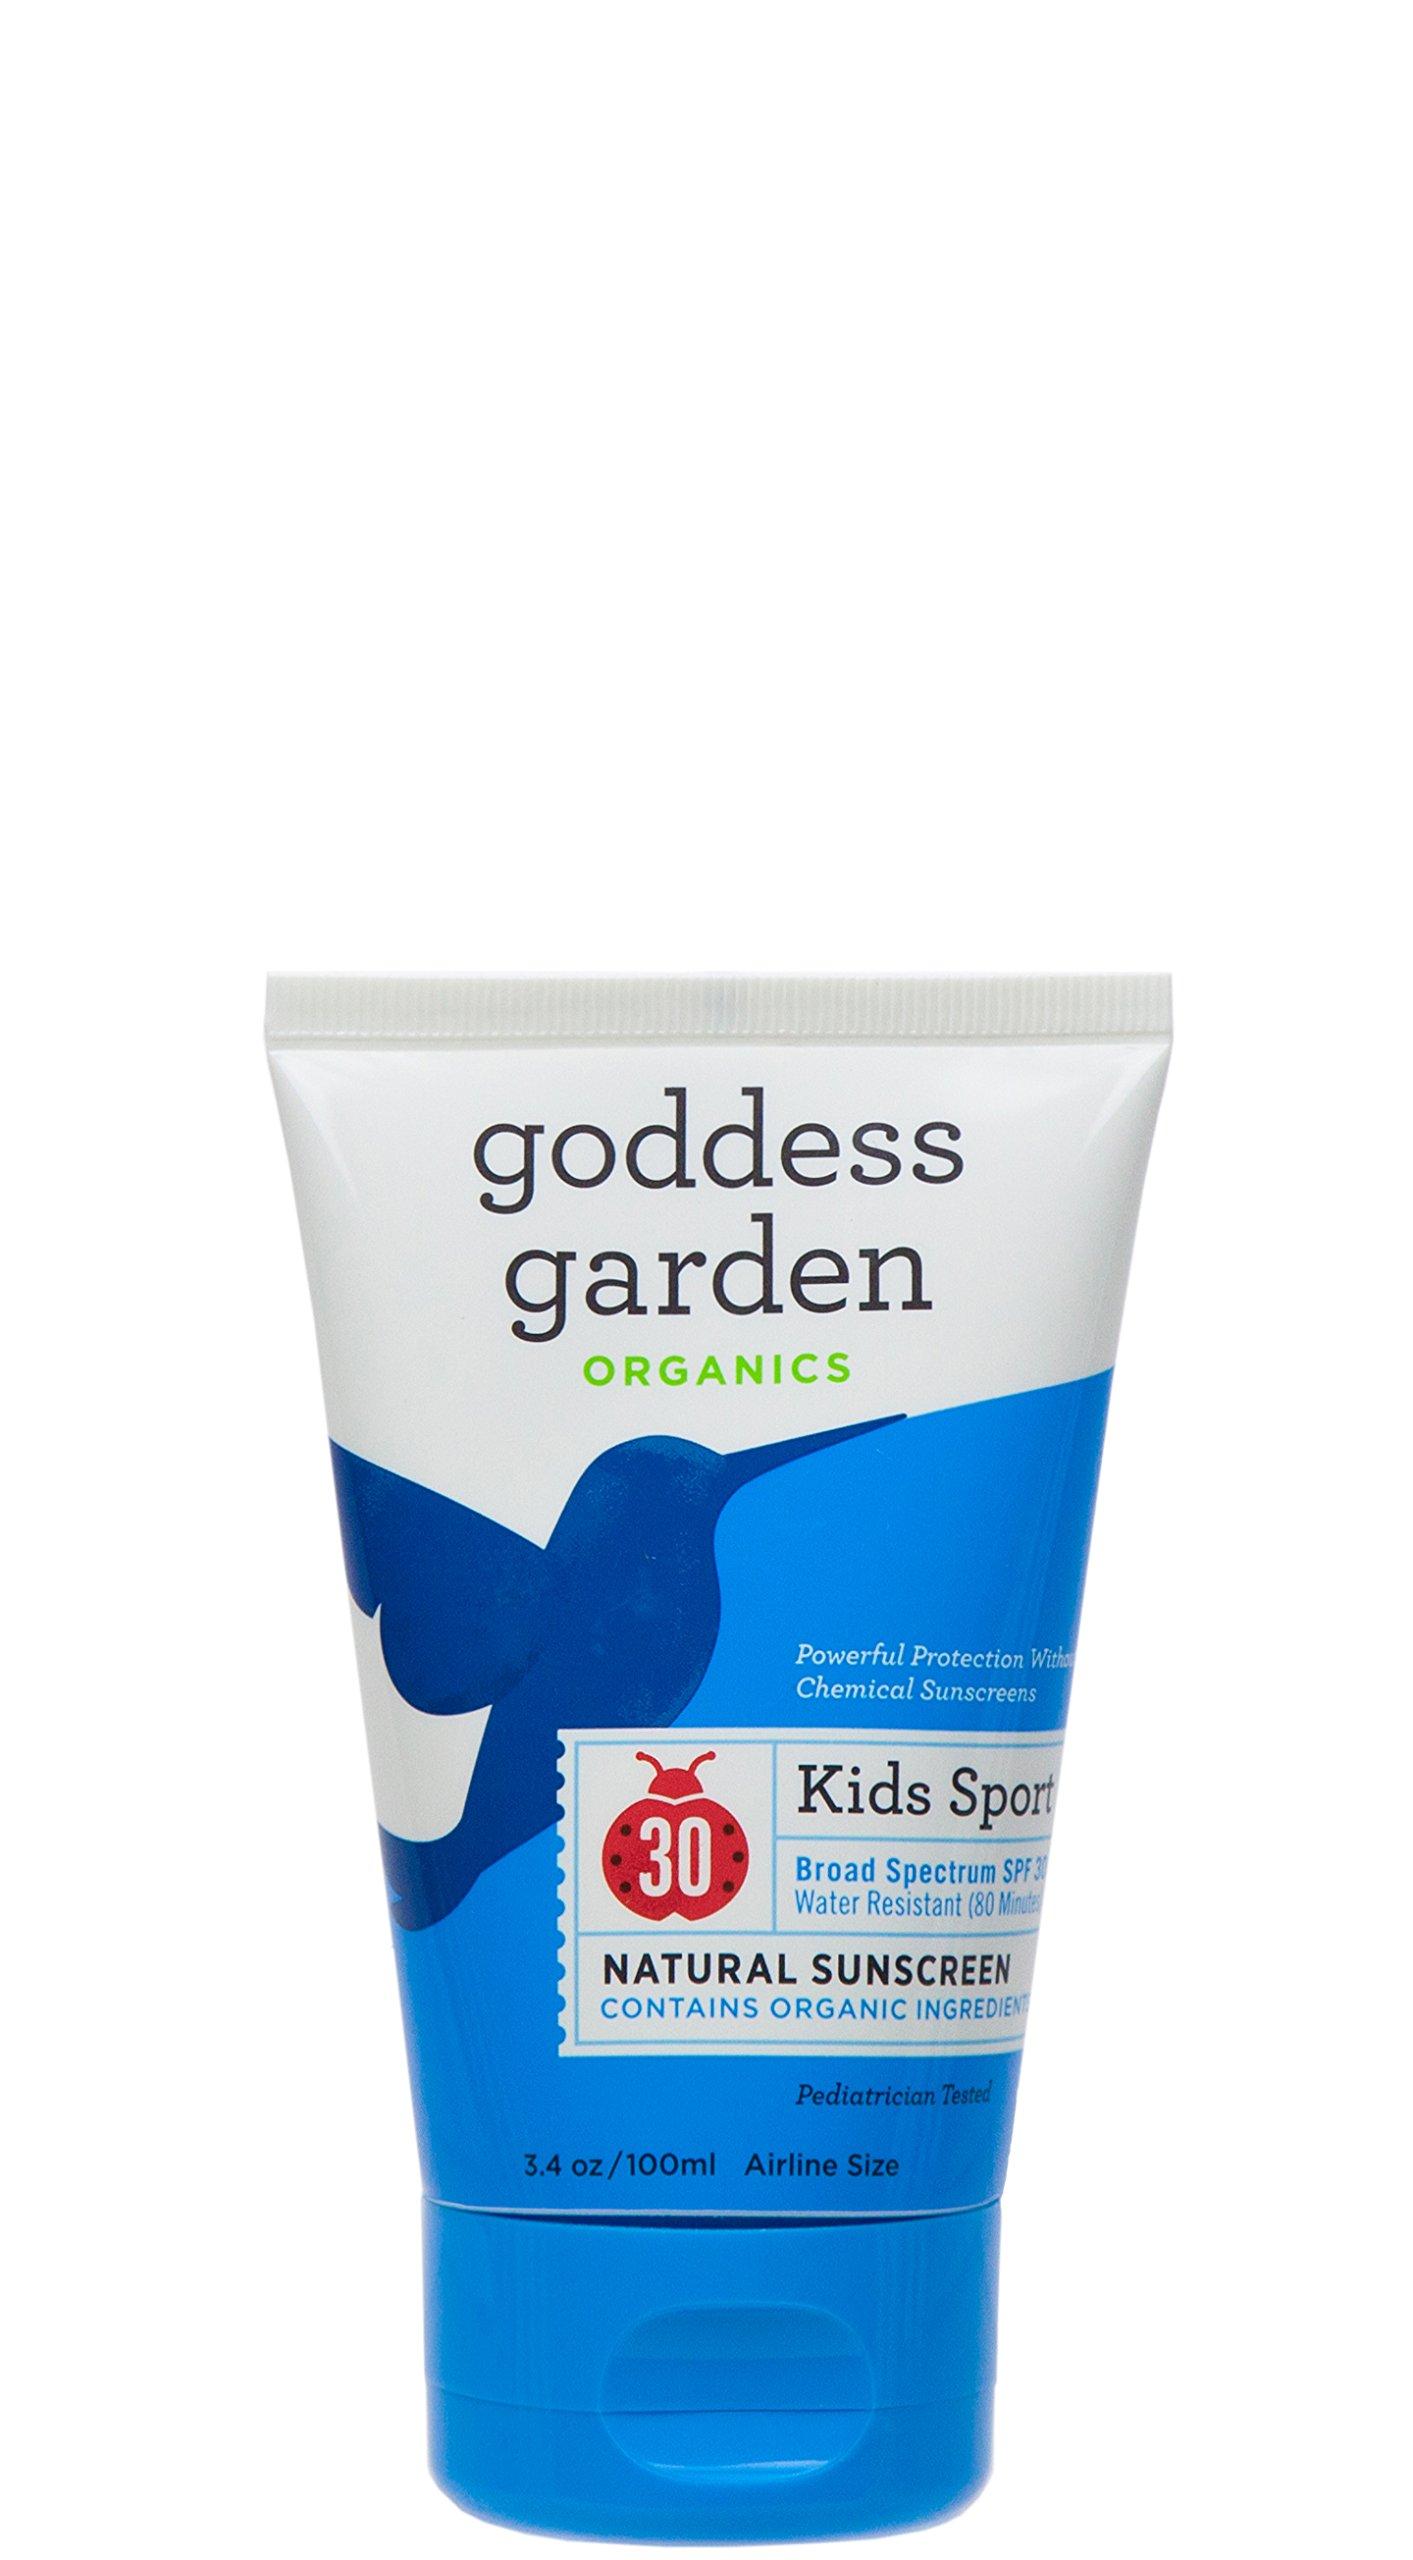 Goddess Garden Organics Baby Natural Sunscreen Lotion Spf